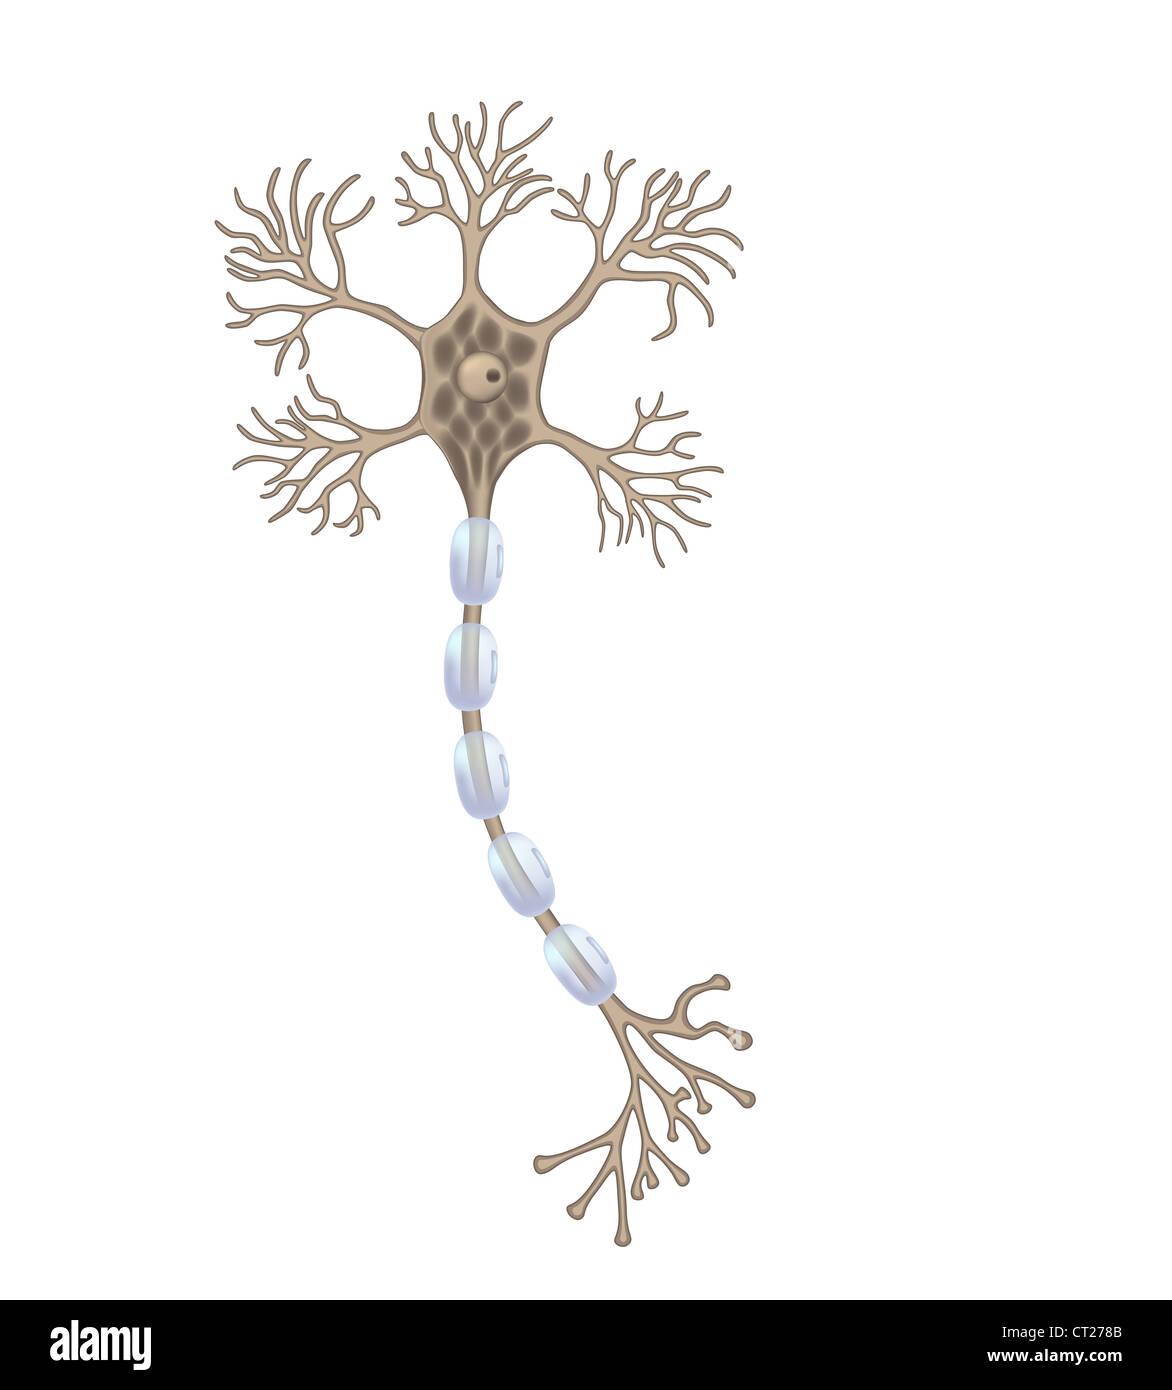 Motor neuron - Stock Image